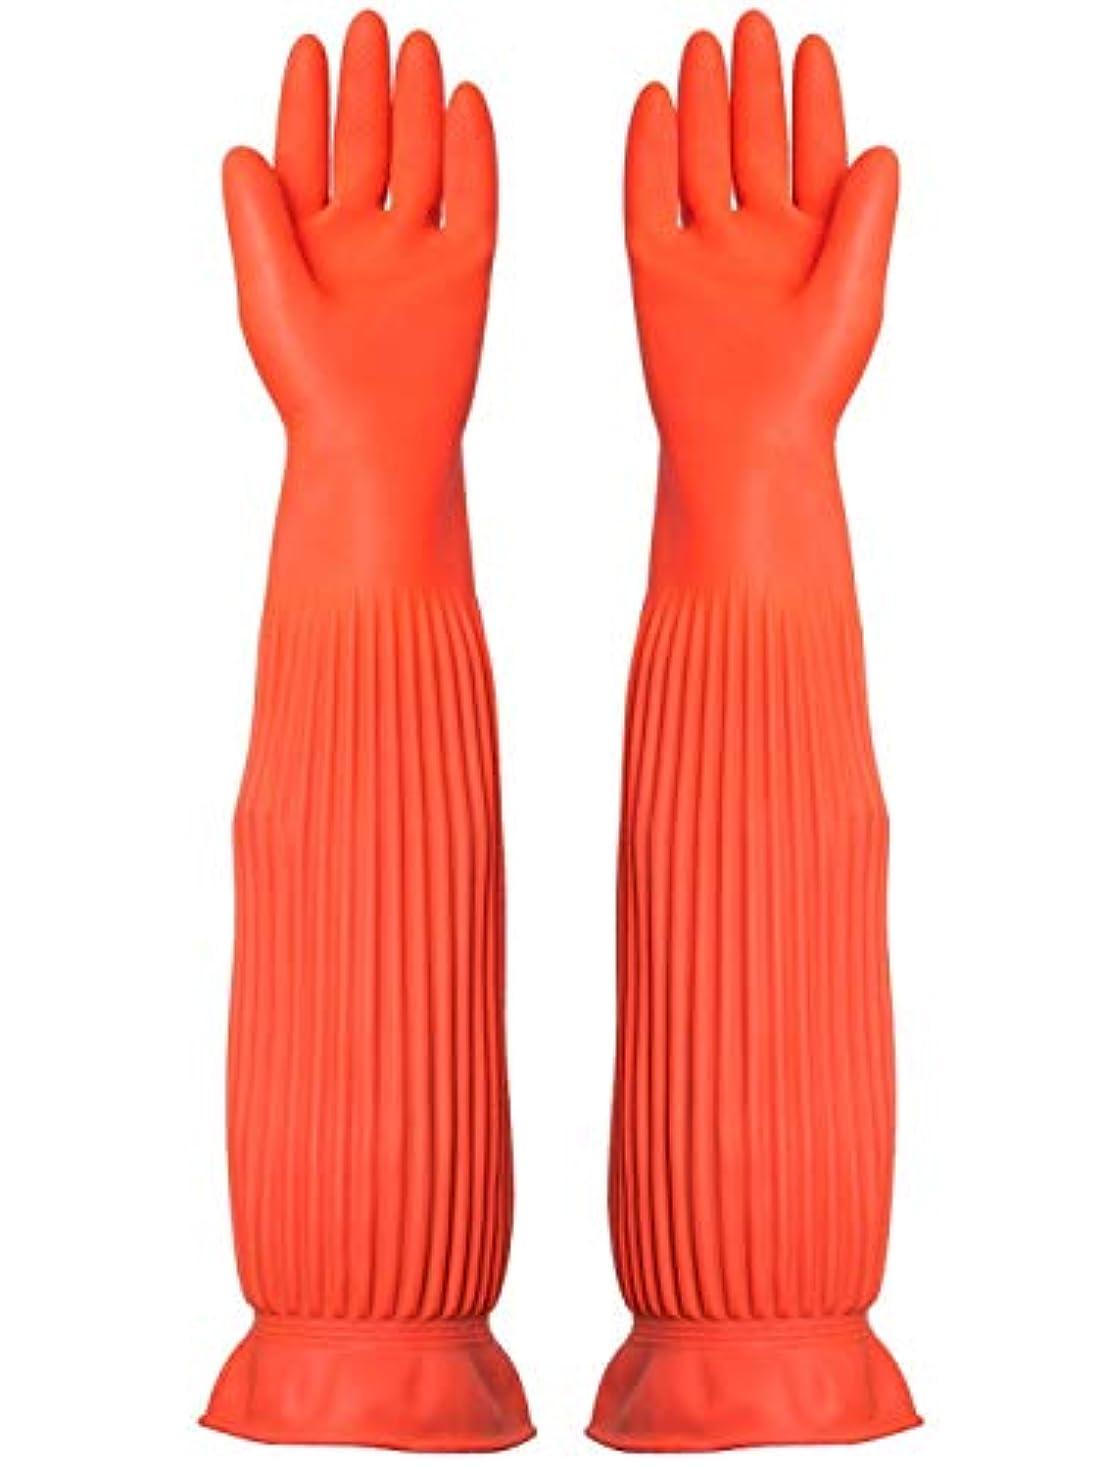 名誉怠感風刺BTXXYJP キッチン用手袋 手袋 耐摩耗 食器洗い 作業 炊事 食器洗い 掃除 園芸 洗車 防水 防油 手袋 (Color : ORANGE, Size : M)